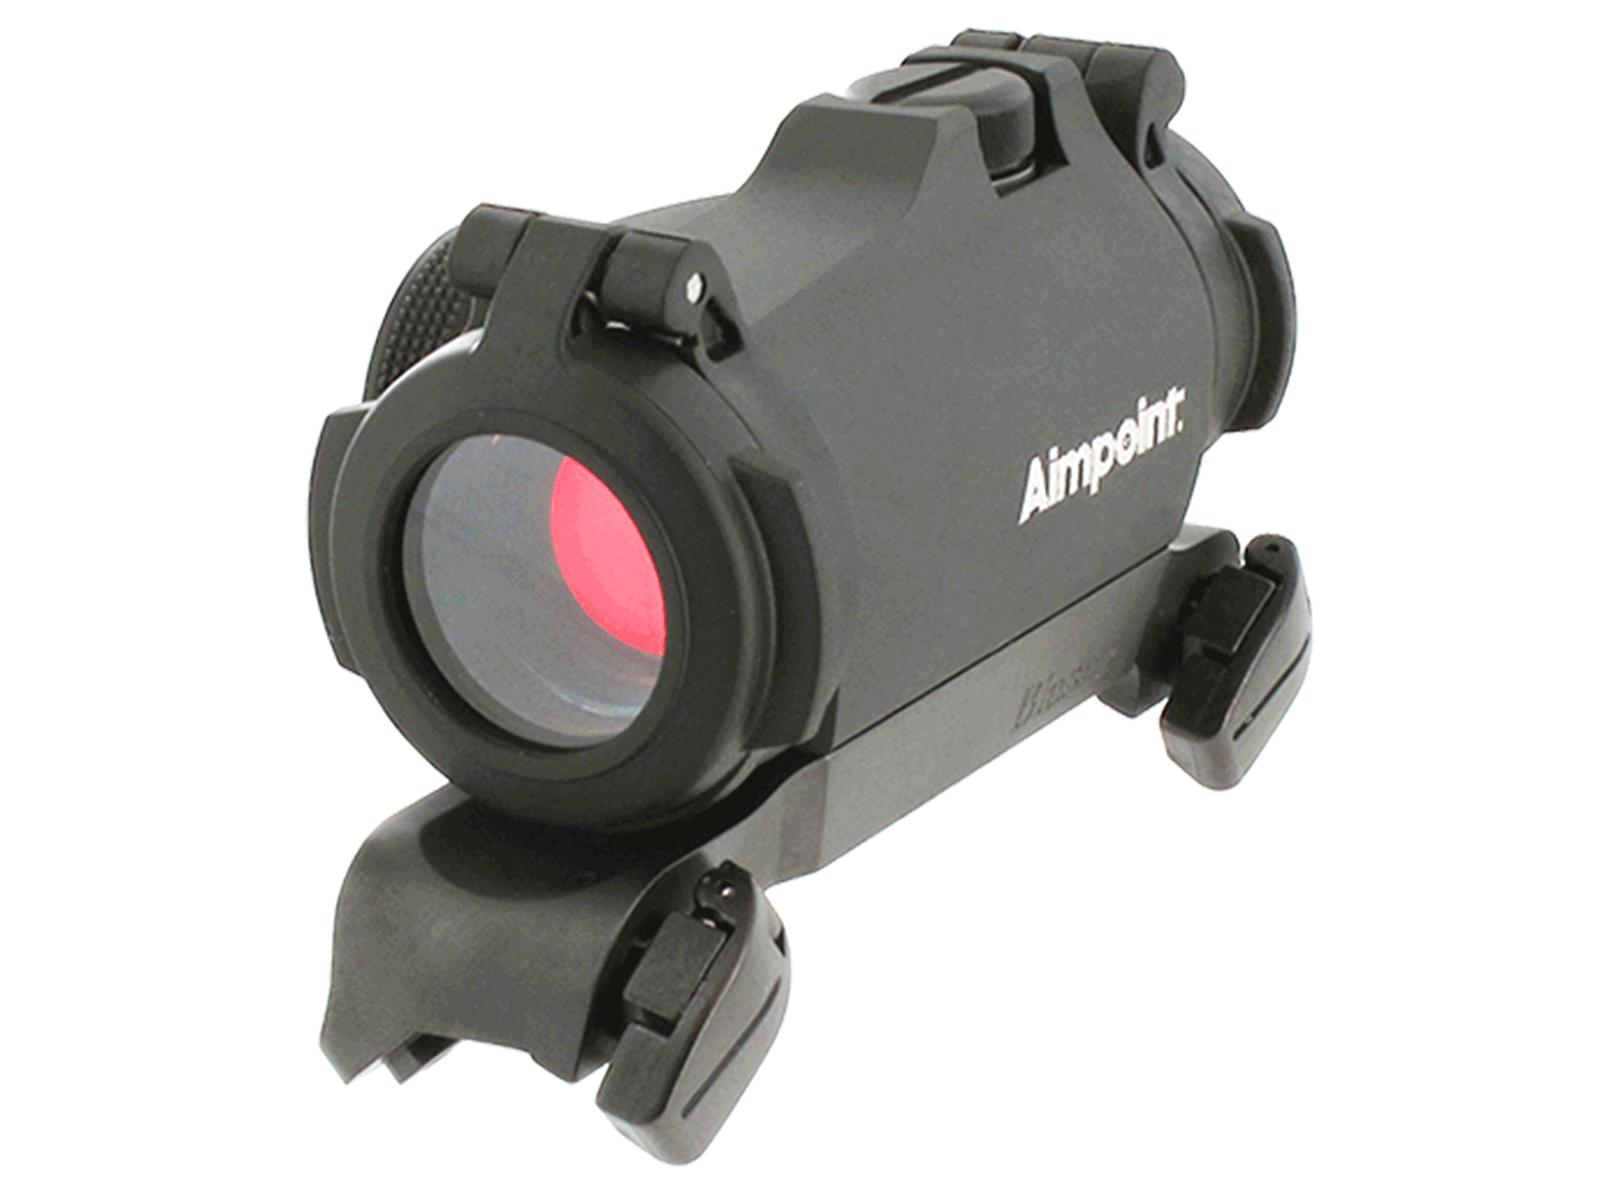 Aimpoint MICRO H-2 2 MOA ACET Technologie black mit org. Blaser Sattelmontage